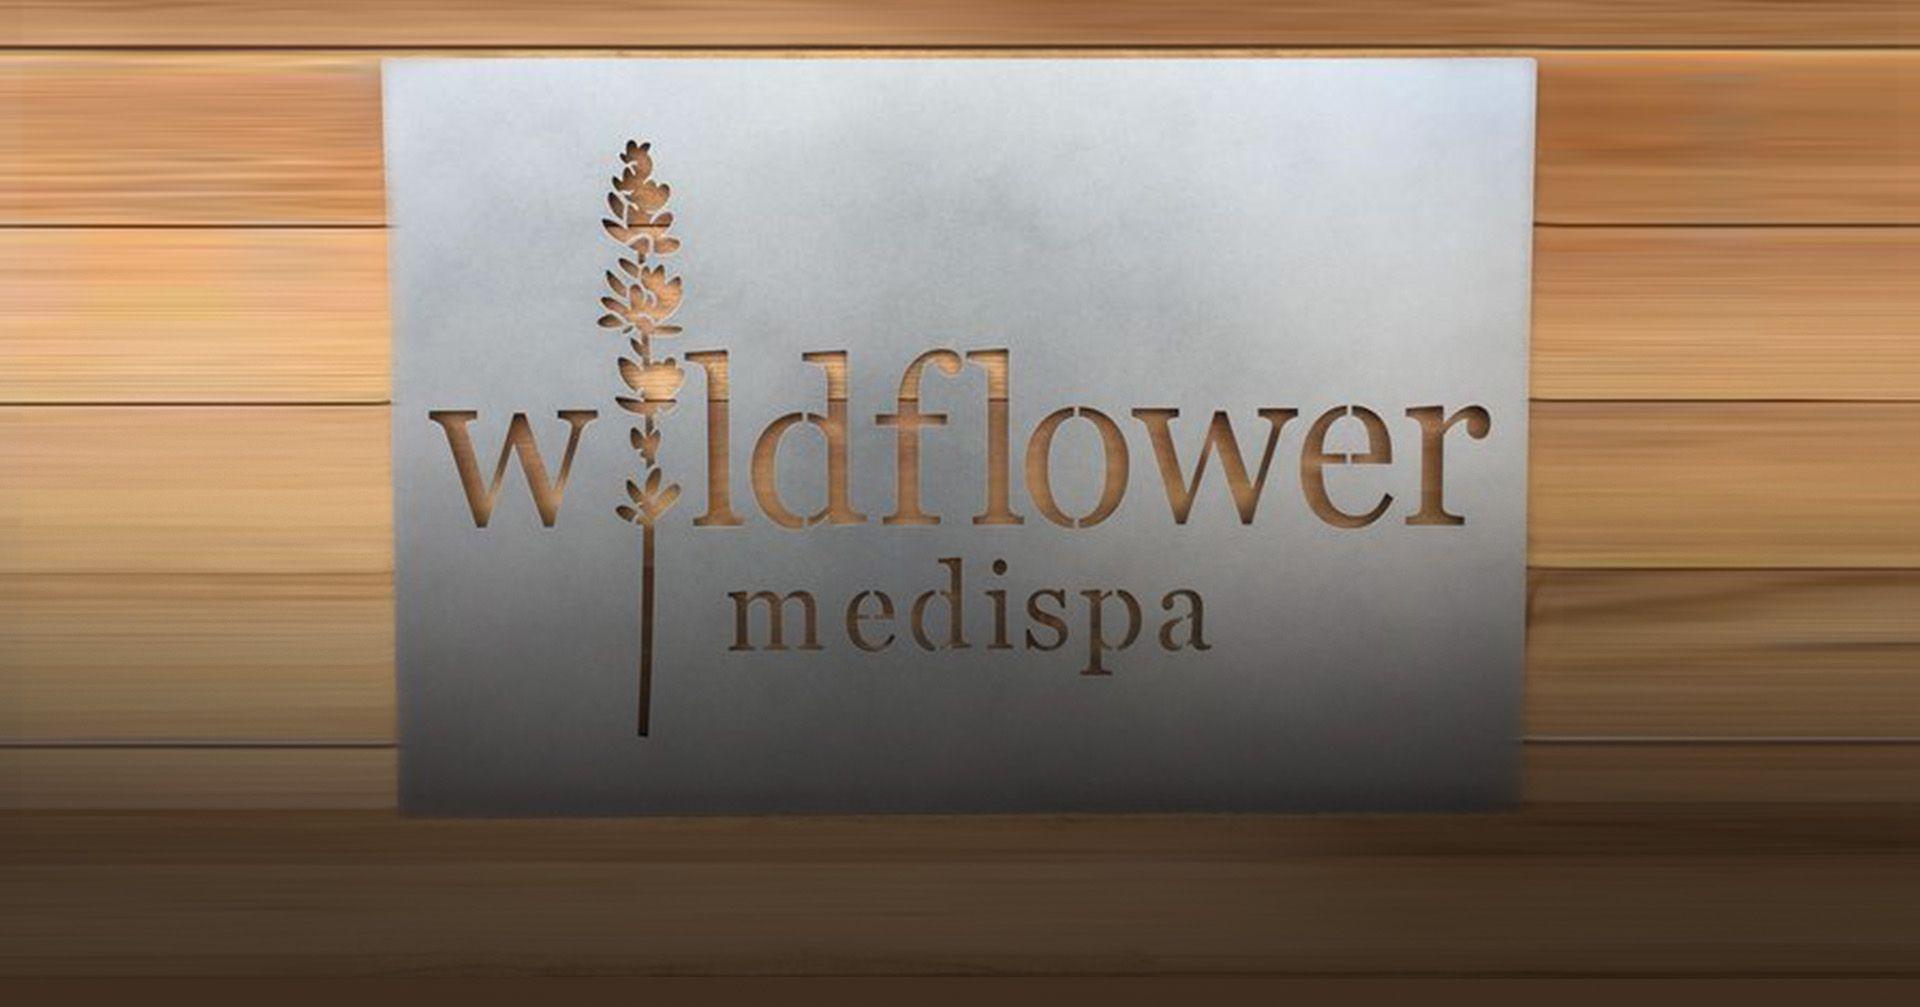 Wildflower Medispa Logo Signage